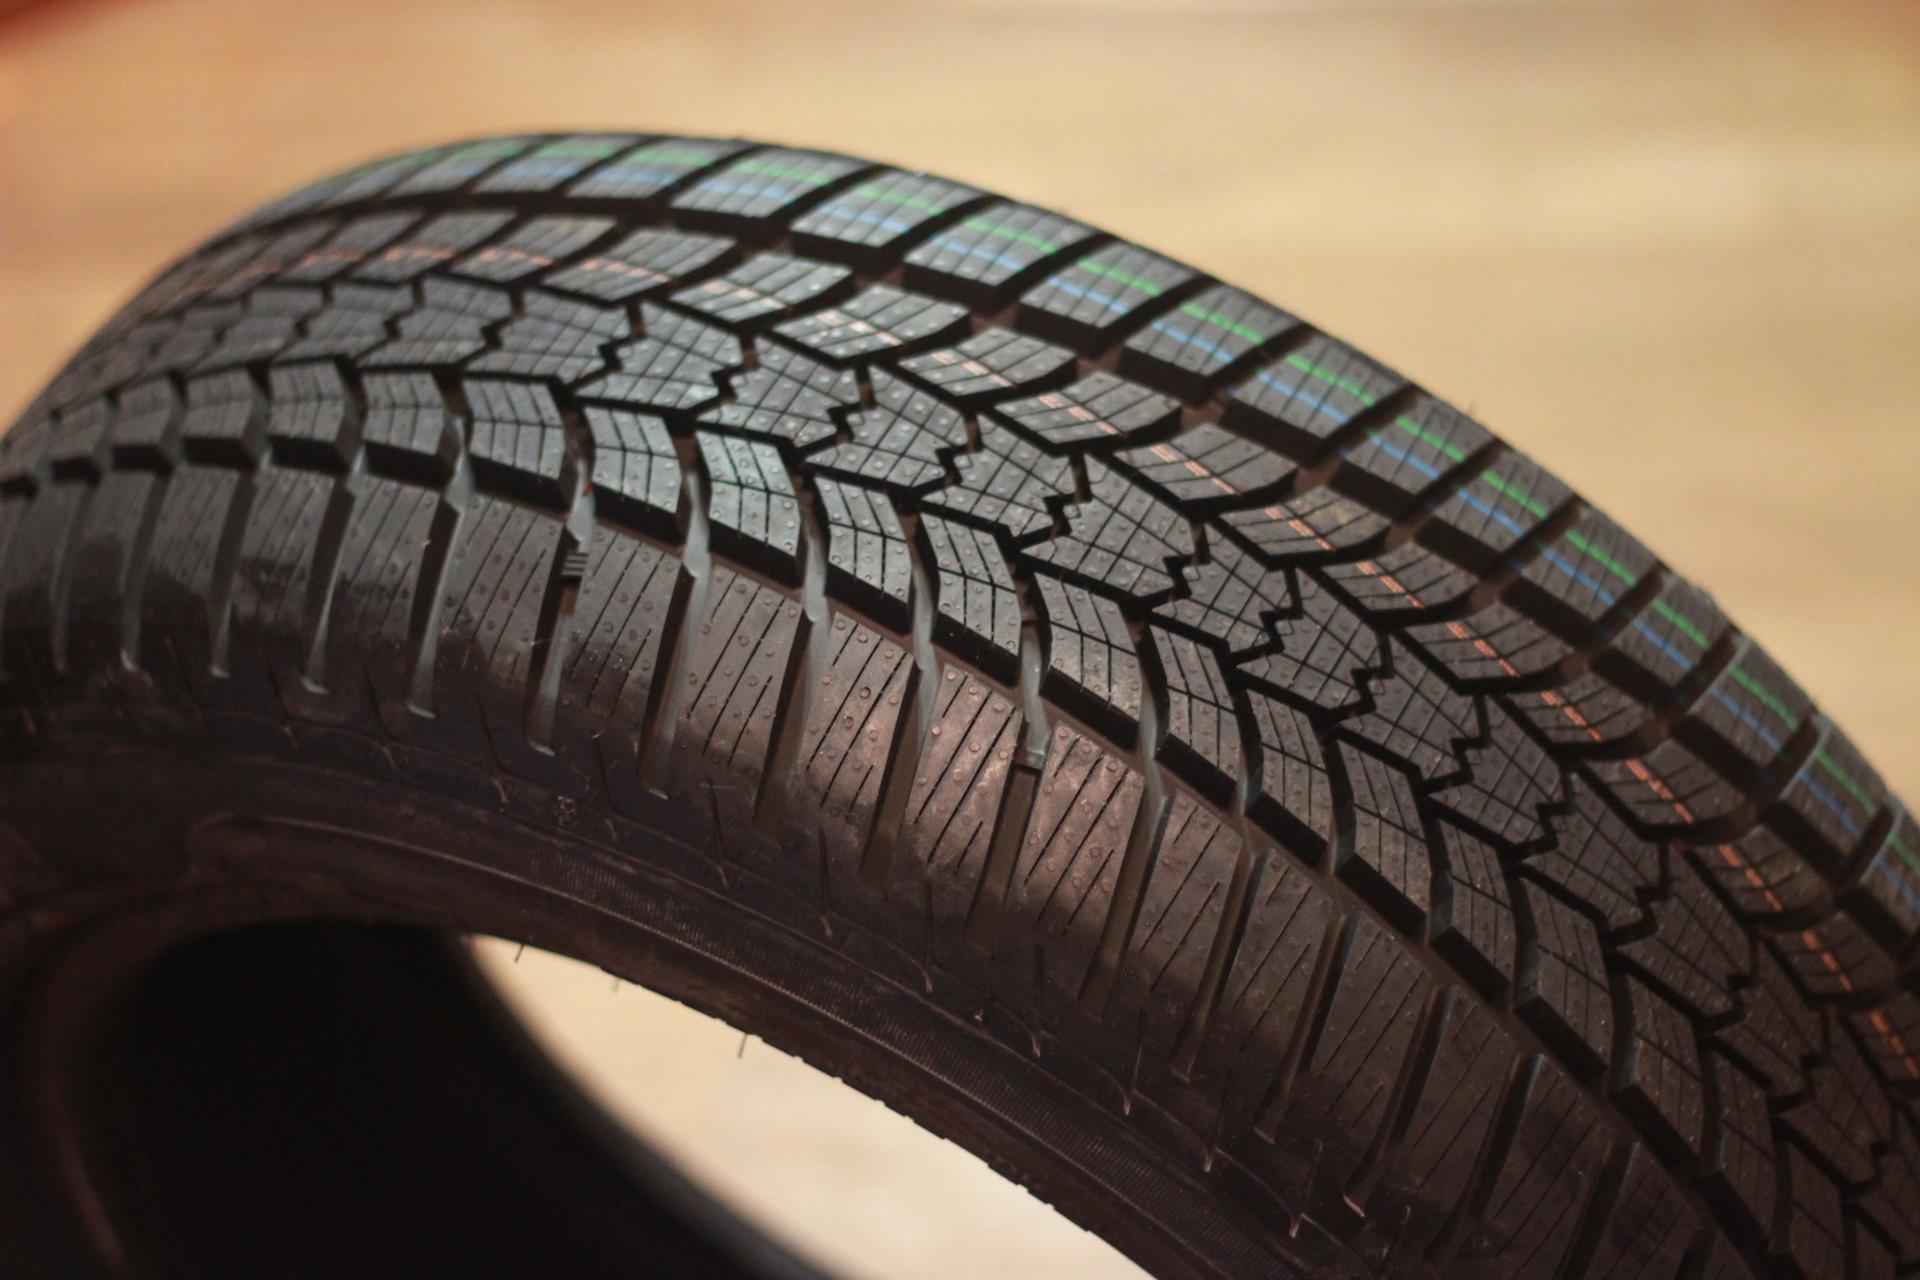 sava eskimo | eBay, 225/55R17 ESKIMO HP 2 XL - Proizvodi - Auto gume - Sava, check Sava Eskimo HP tyres on Oponeo.ie. Read tyre descriptions and reviews. Make the right choice regarding your new tyres.